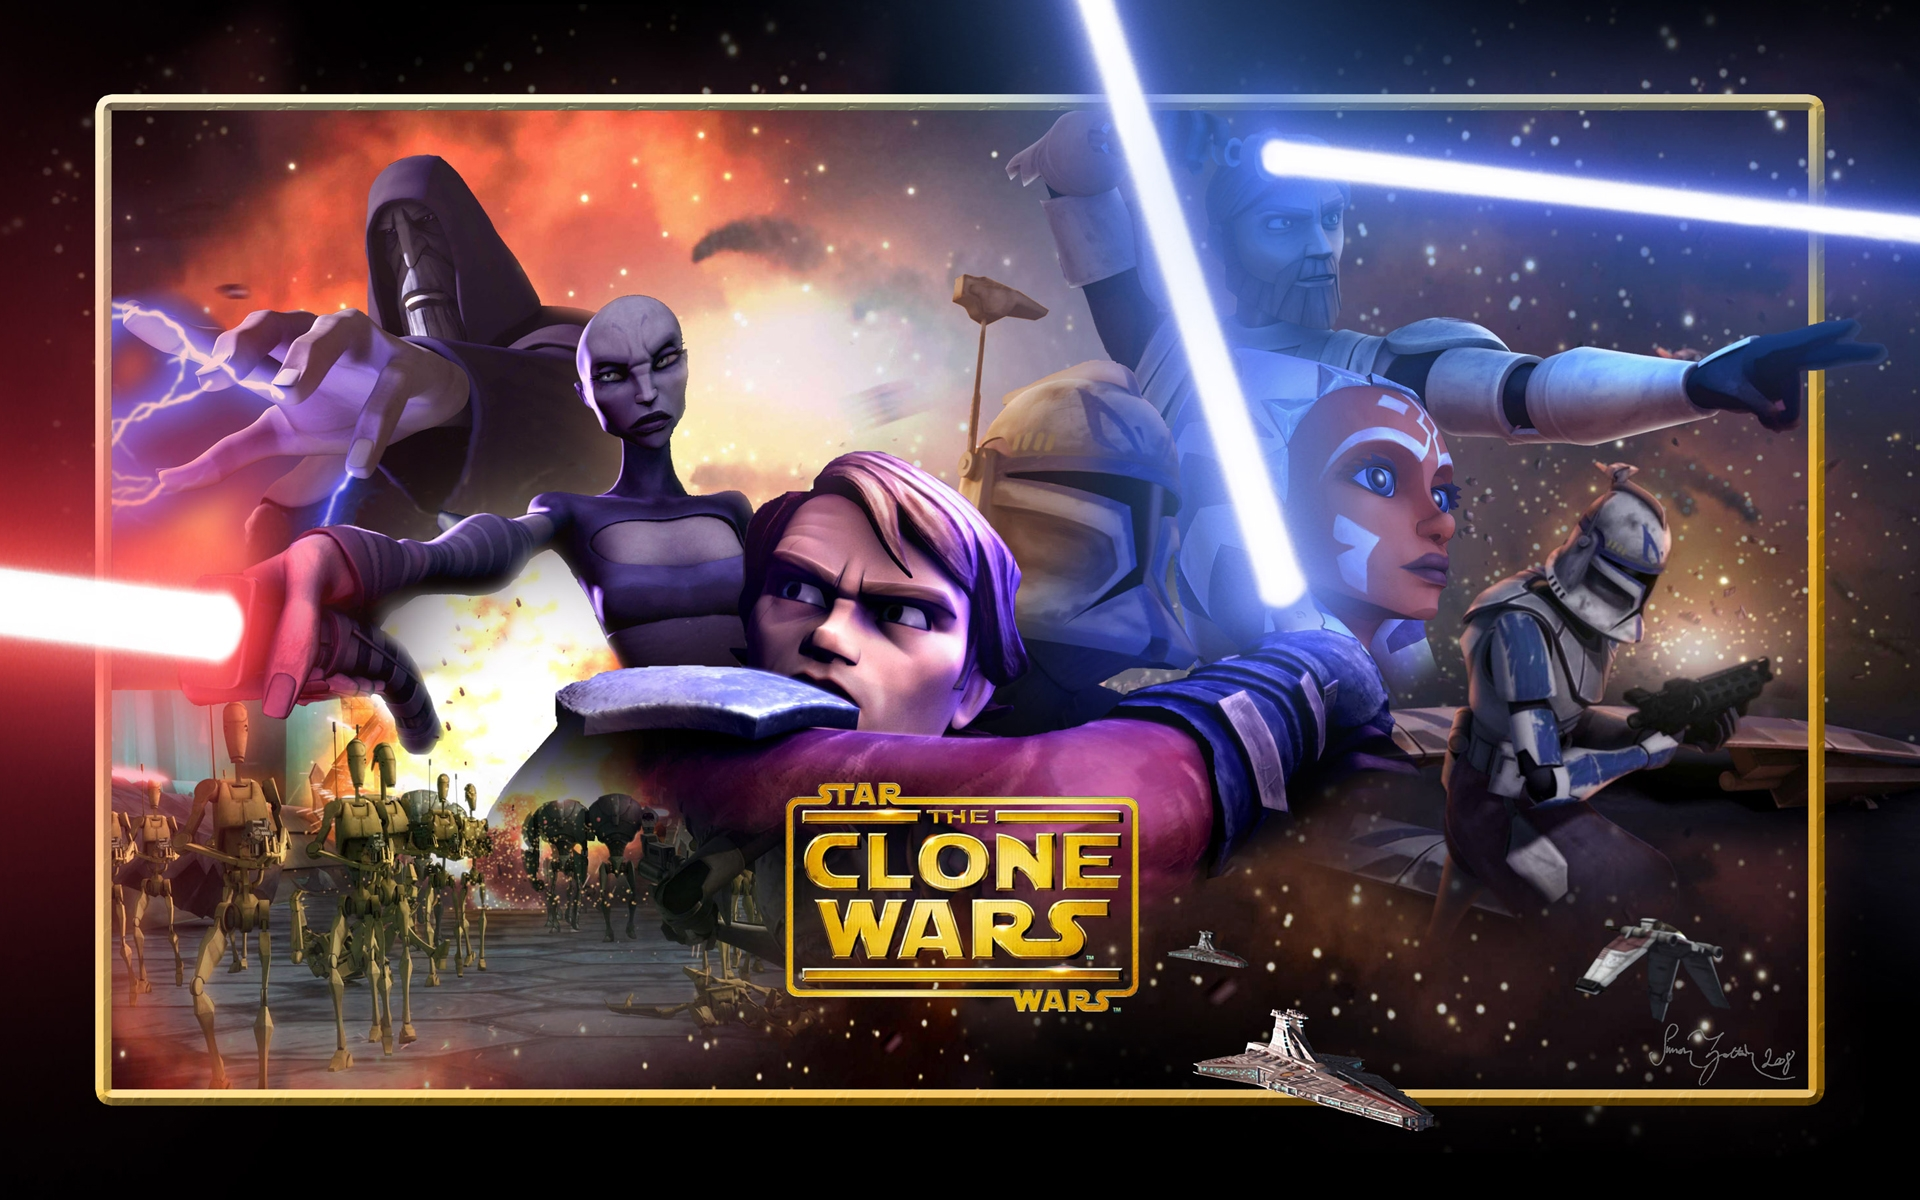 star wars the clone wars (2008)